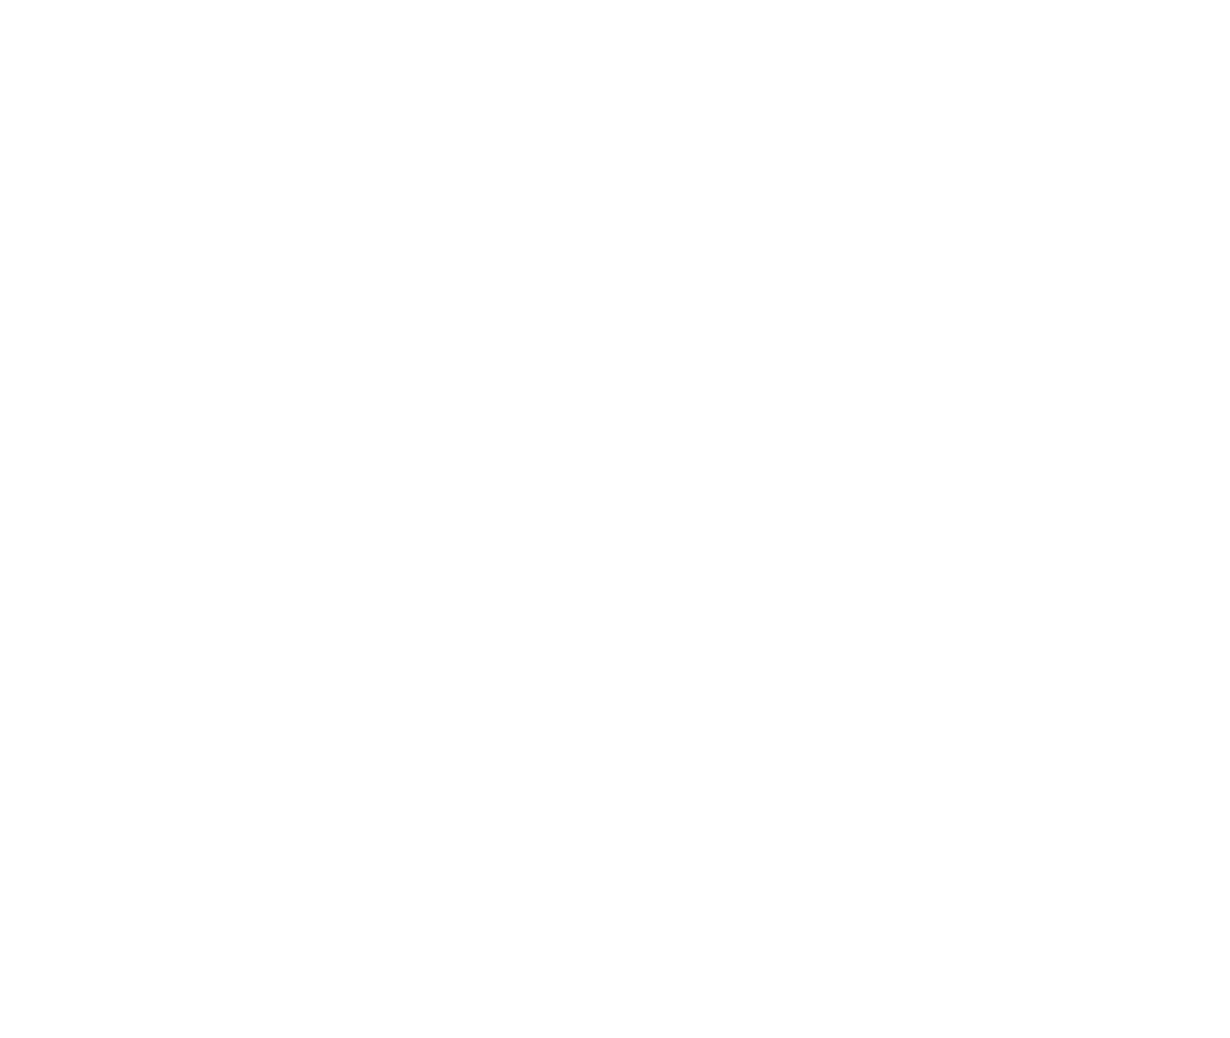 RB dramatic type 2030 white